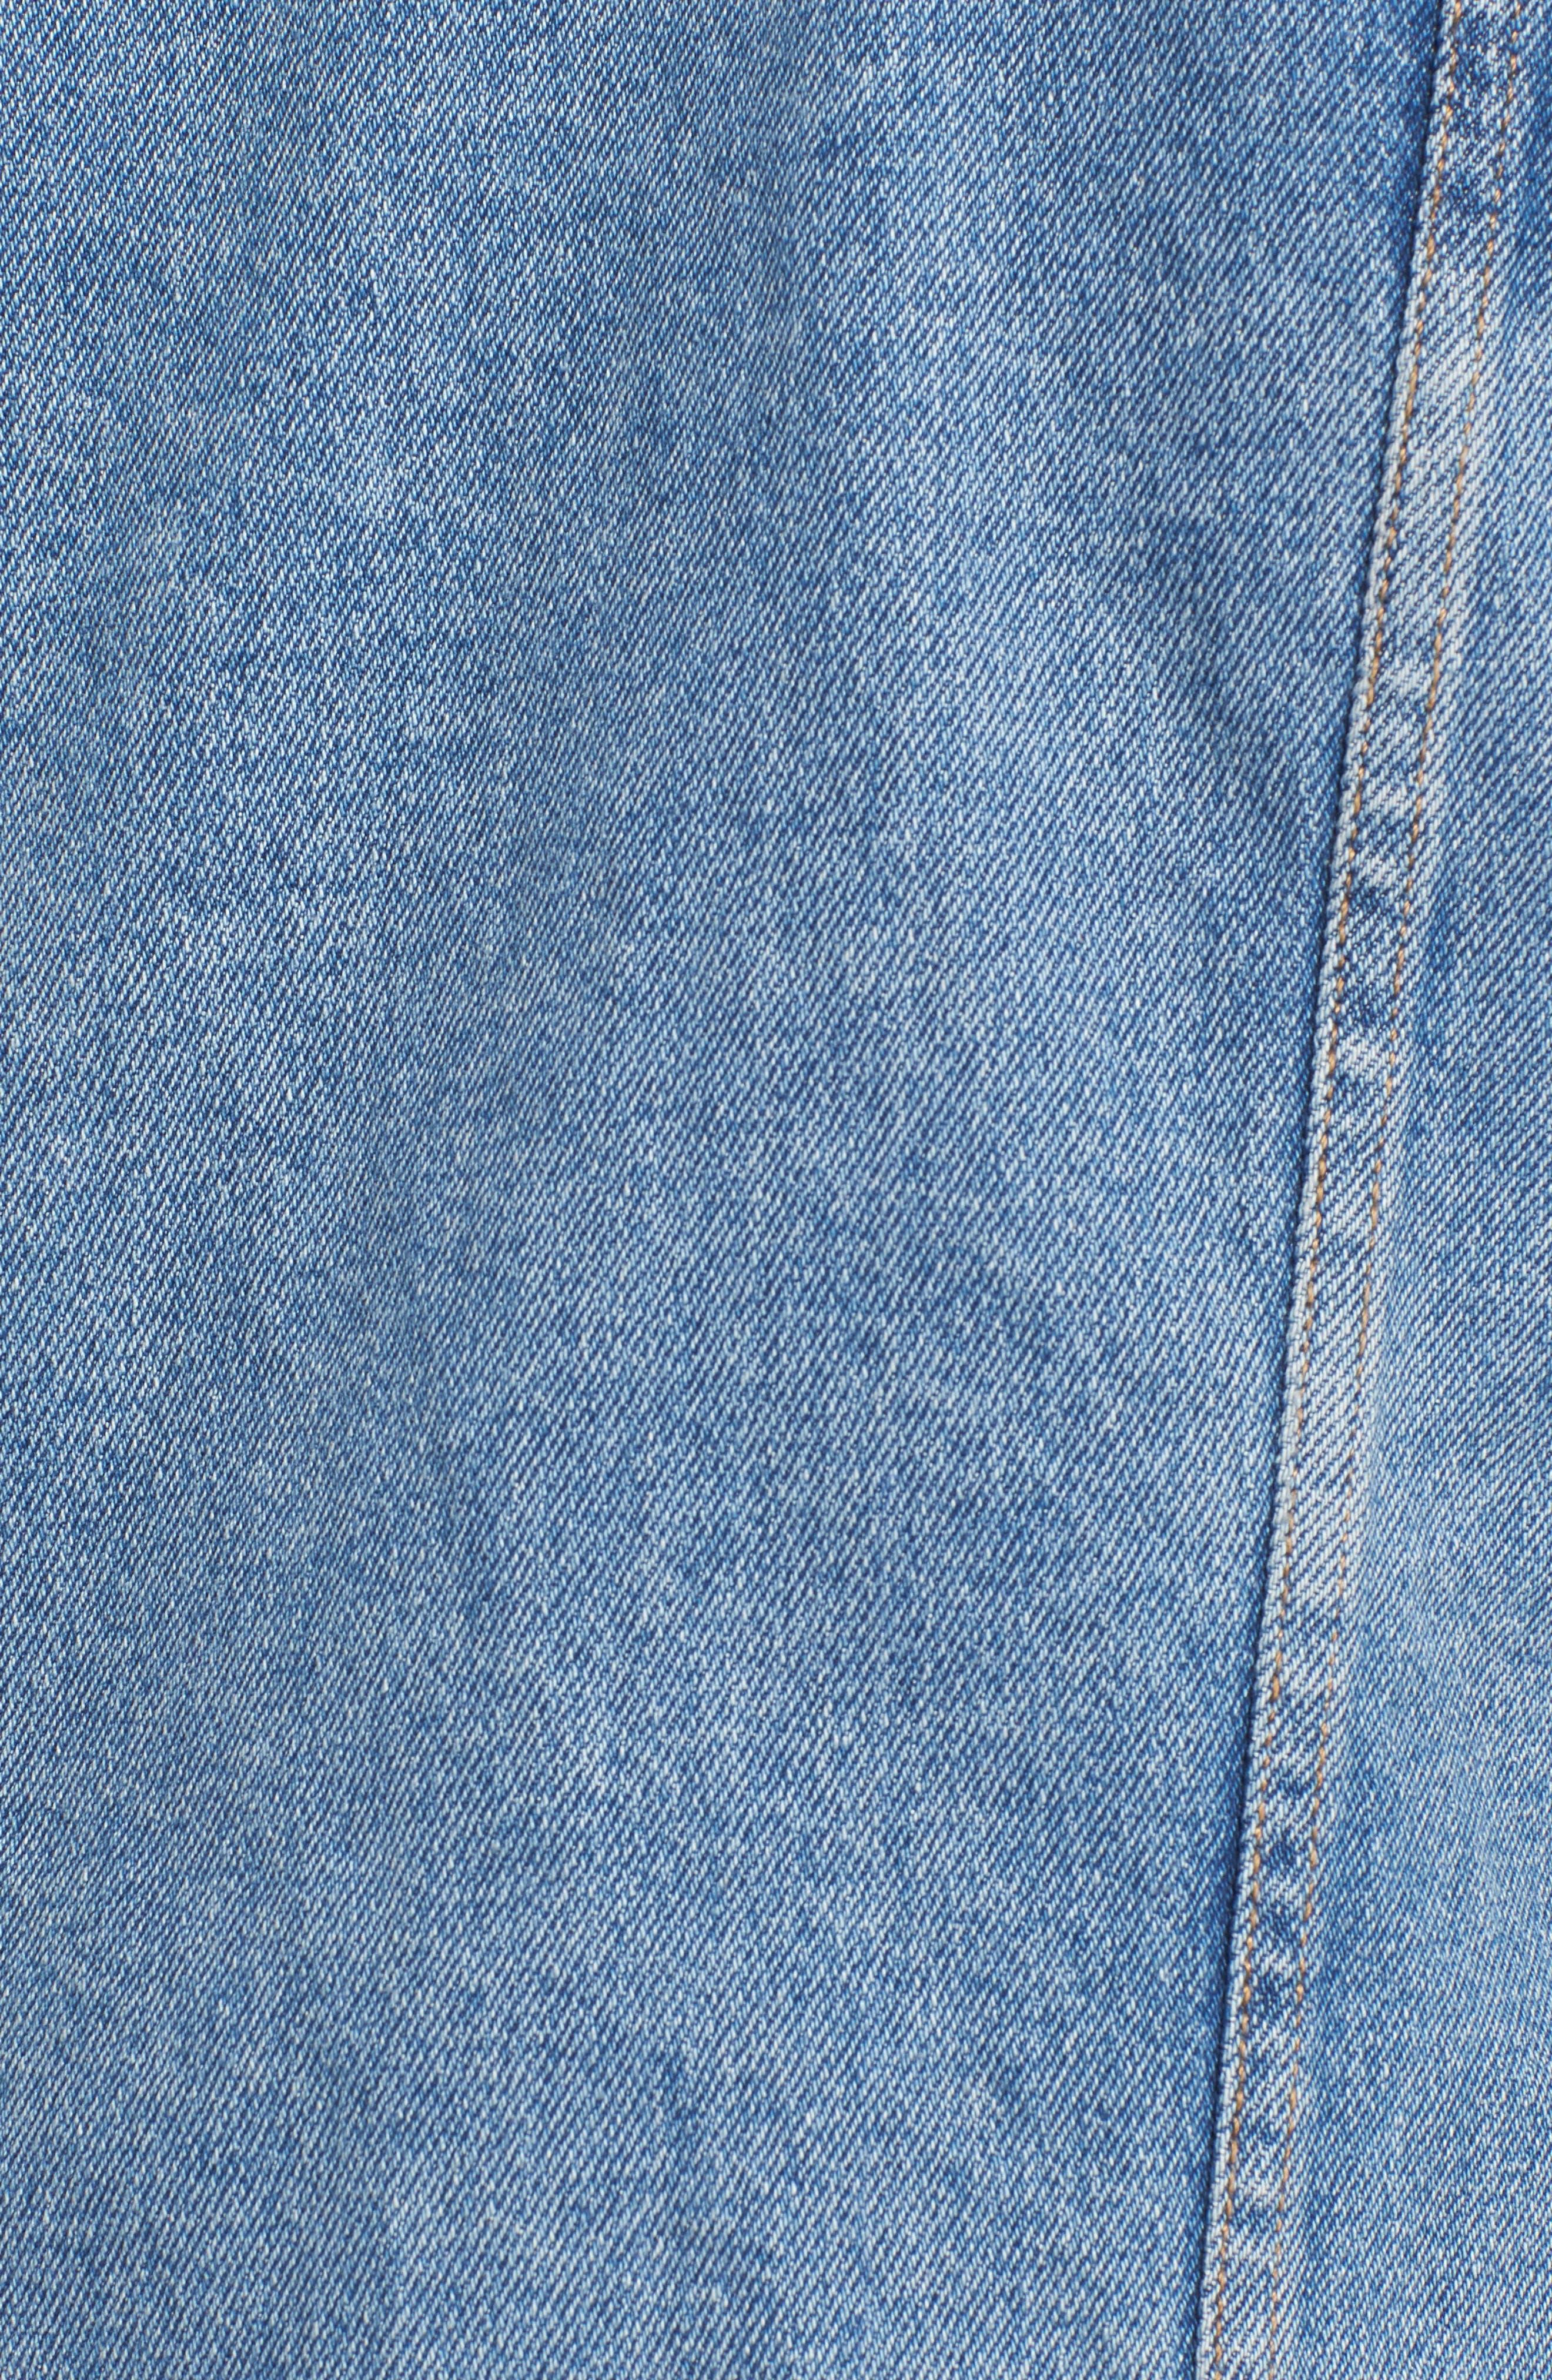 LEVI'S<SUP>®</SUP>, Original Denim Trucker Jacket, Alternate thumbnail 7, color, 420